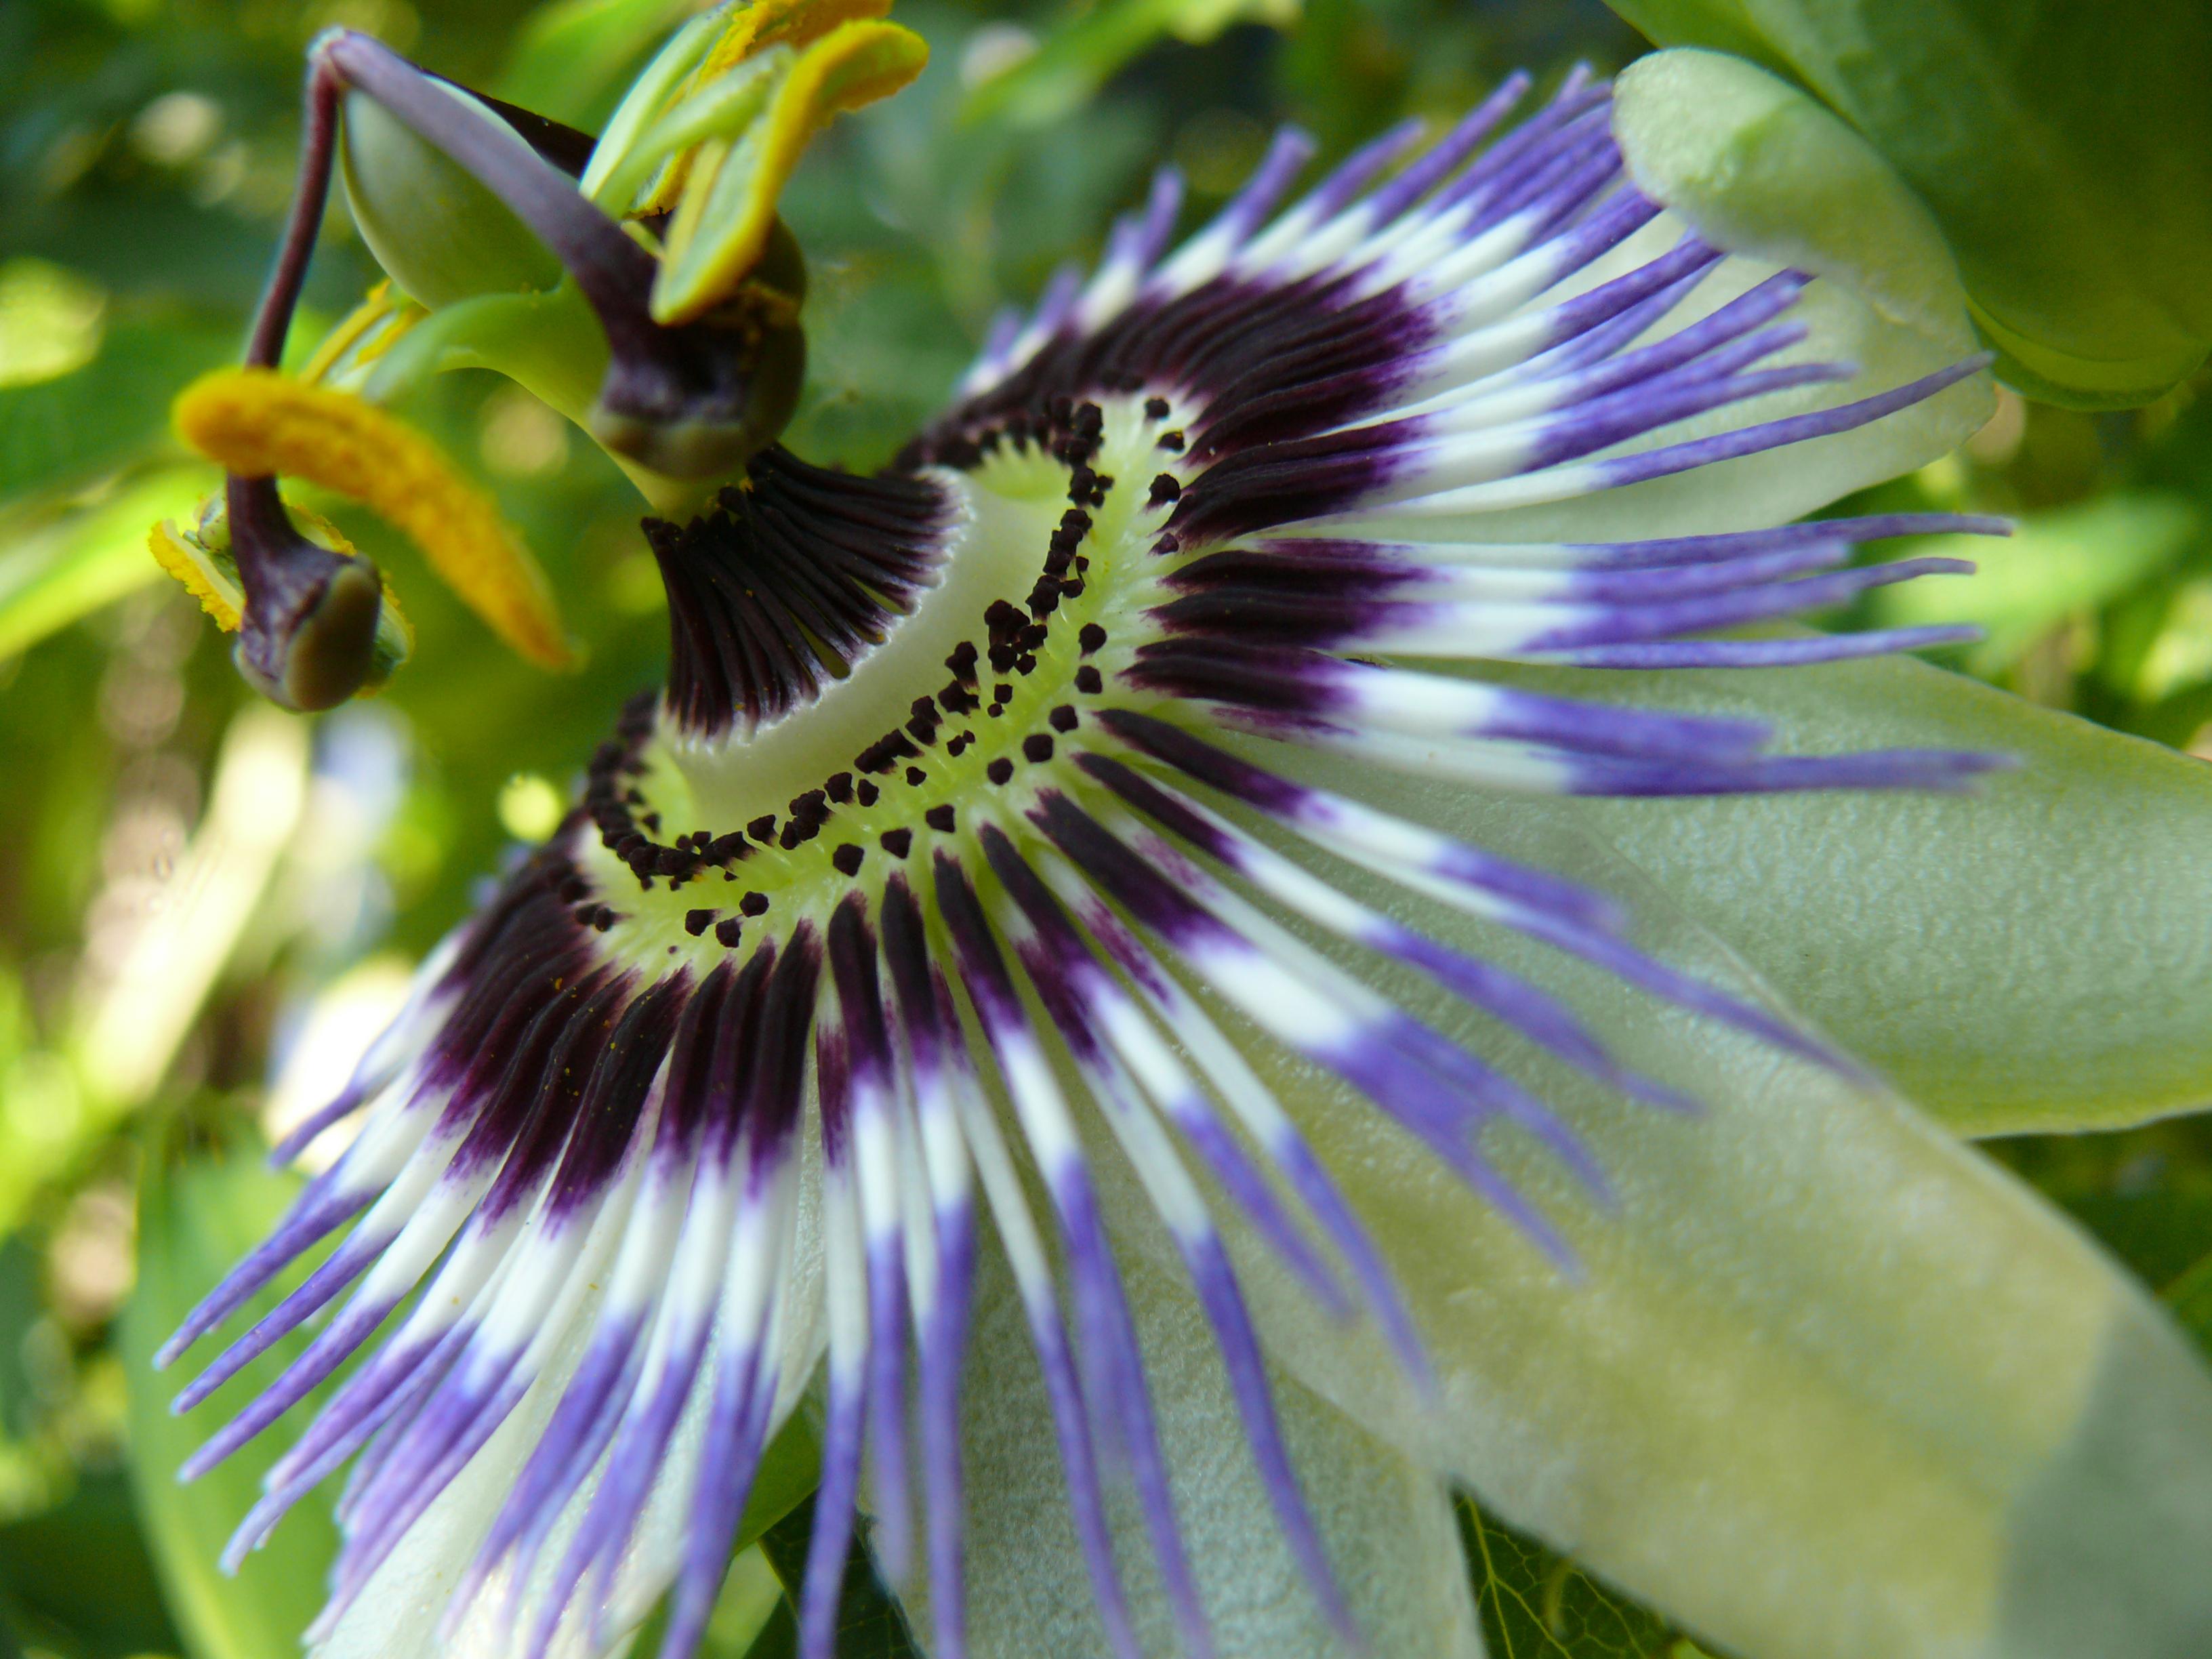 File:Fleur de passiflore.jpg - Wikimedia Commons